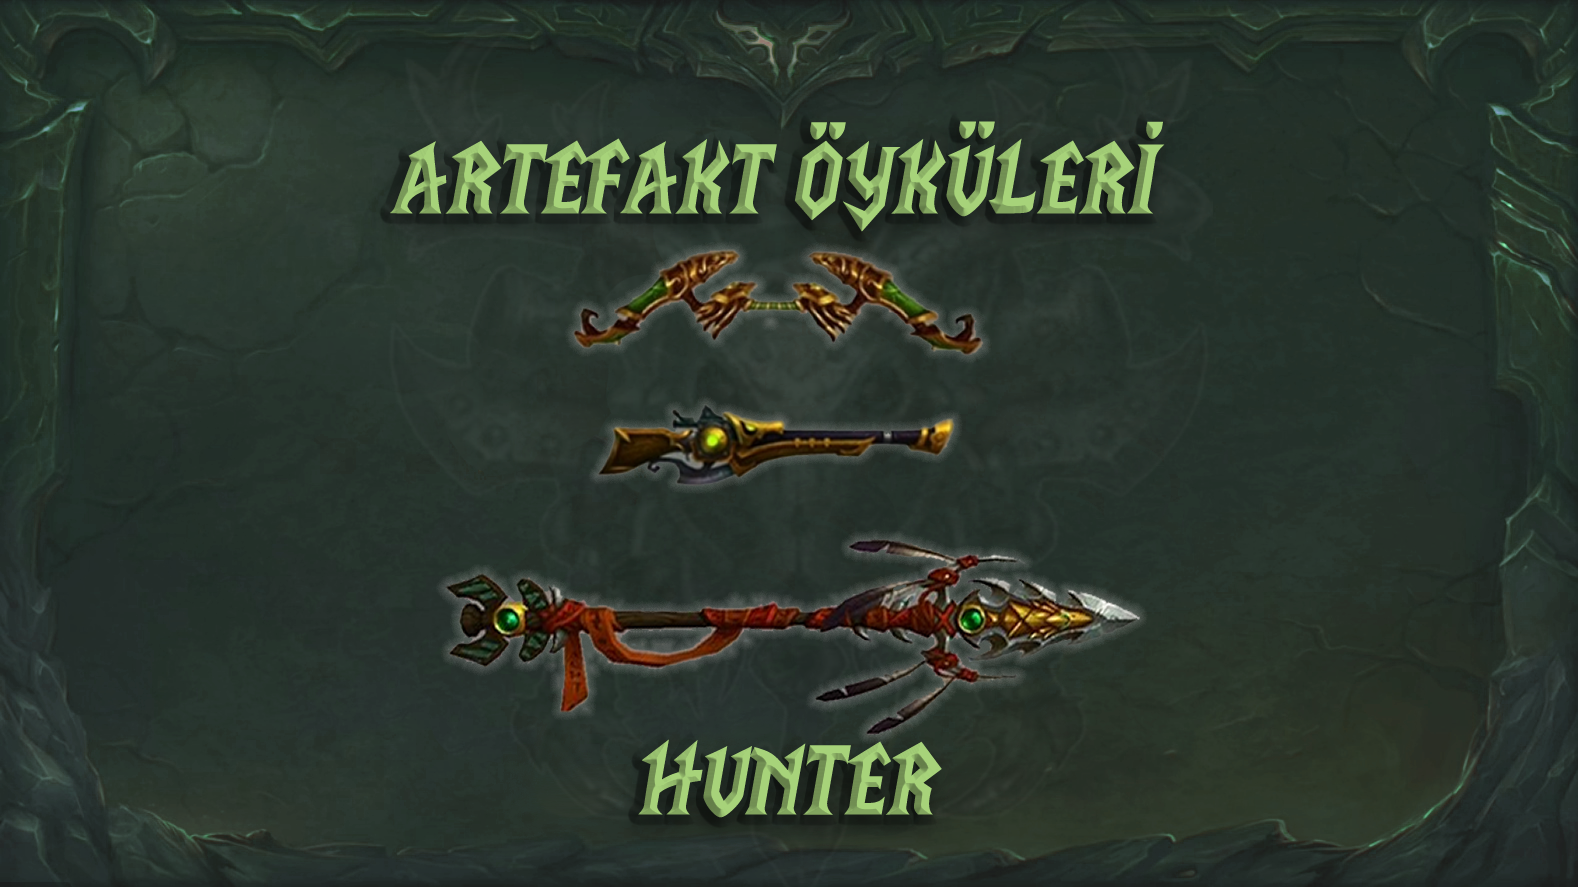 lorekeeper-artefakt-oykuleri-hunter